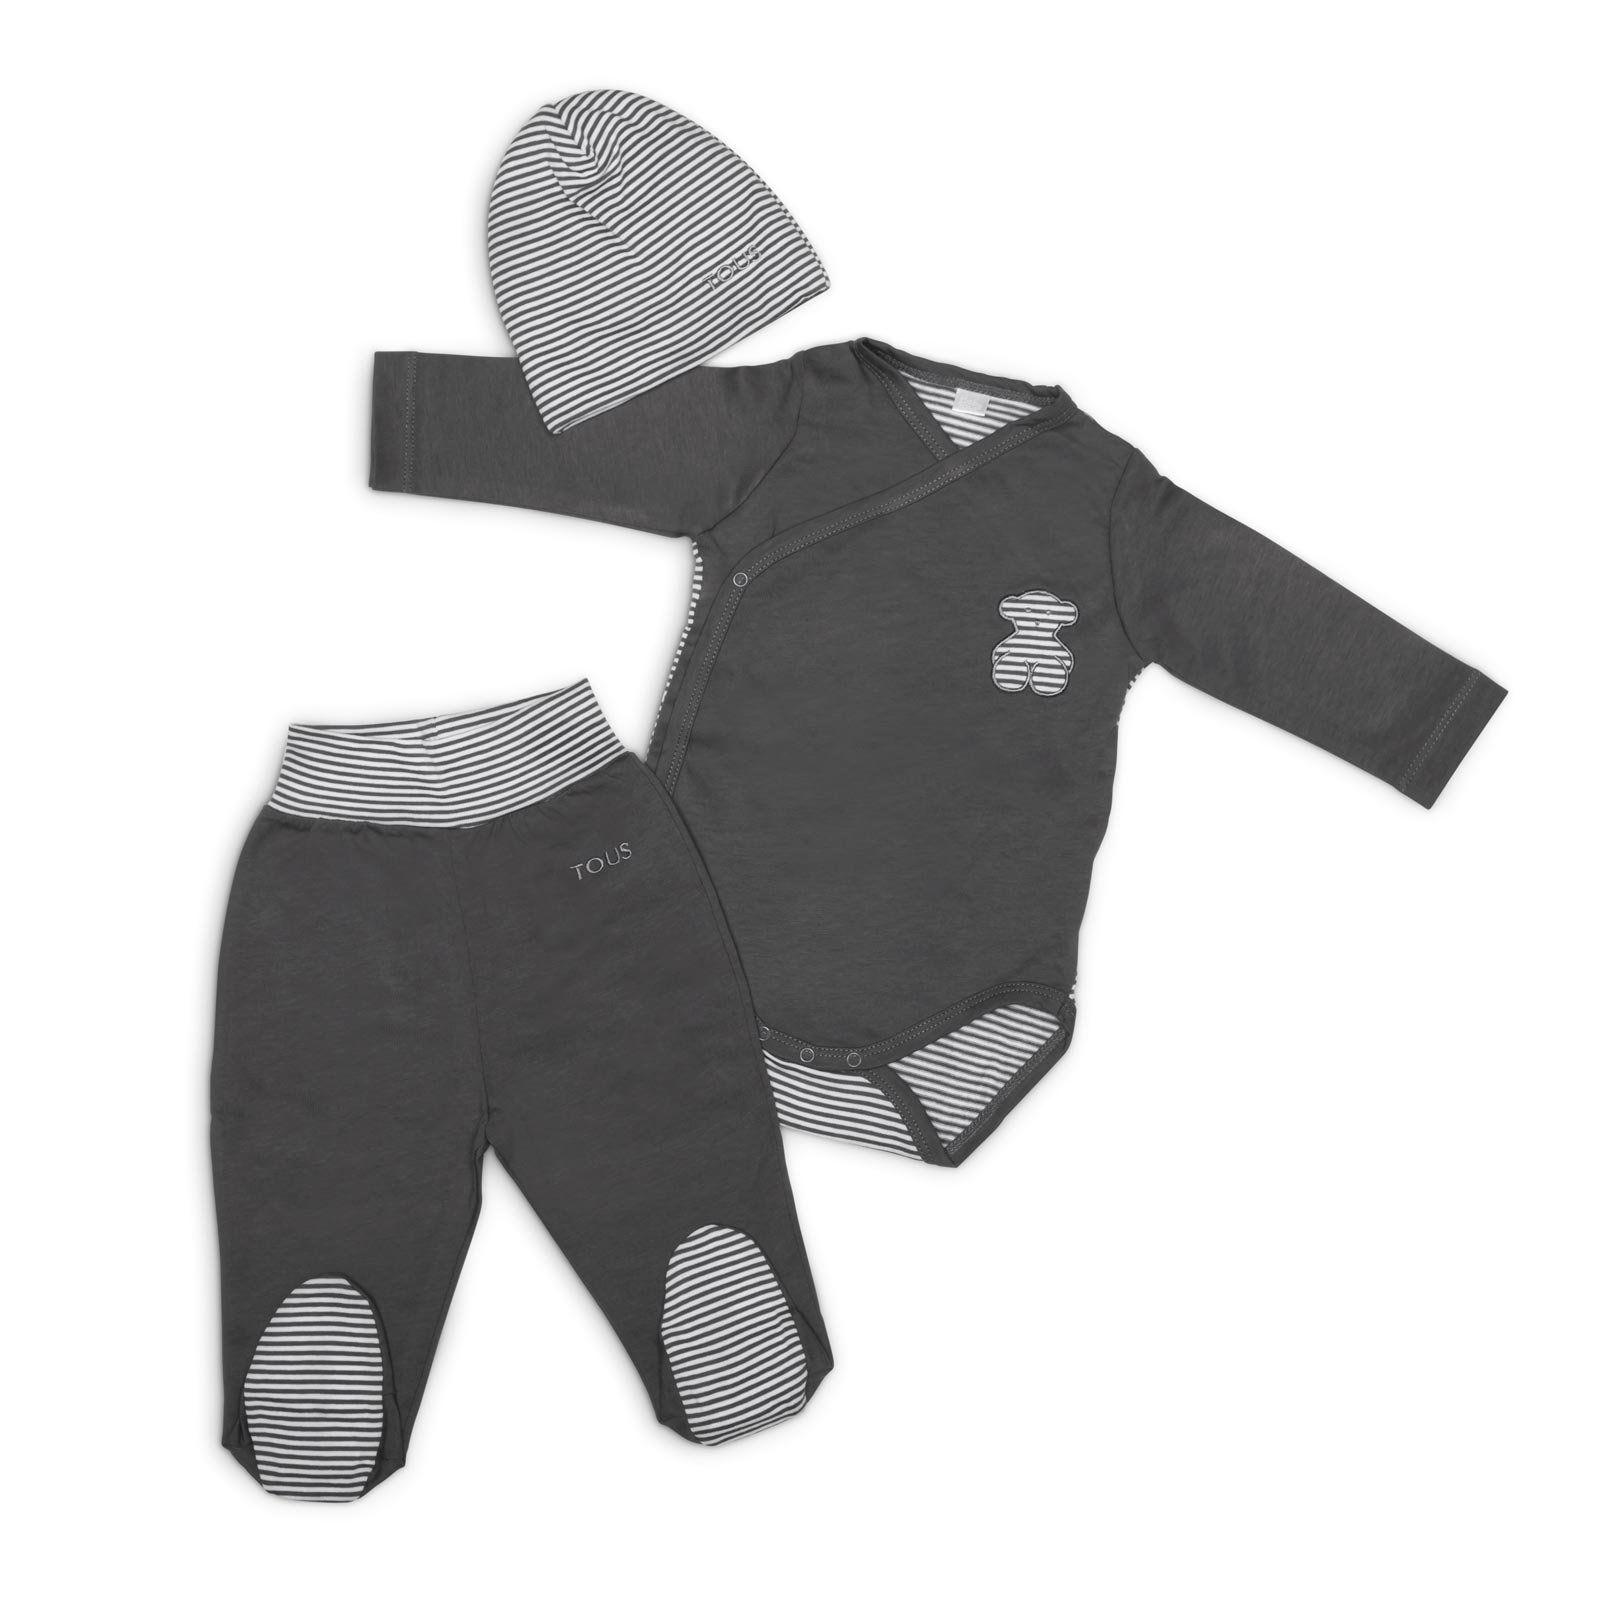 Regalos Para Bebes Recien Nacidos Tous.Tous Baby Set Ropa Bebe Tous Baby Y Ropa Para Ninas